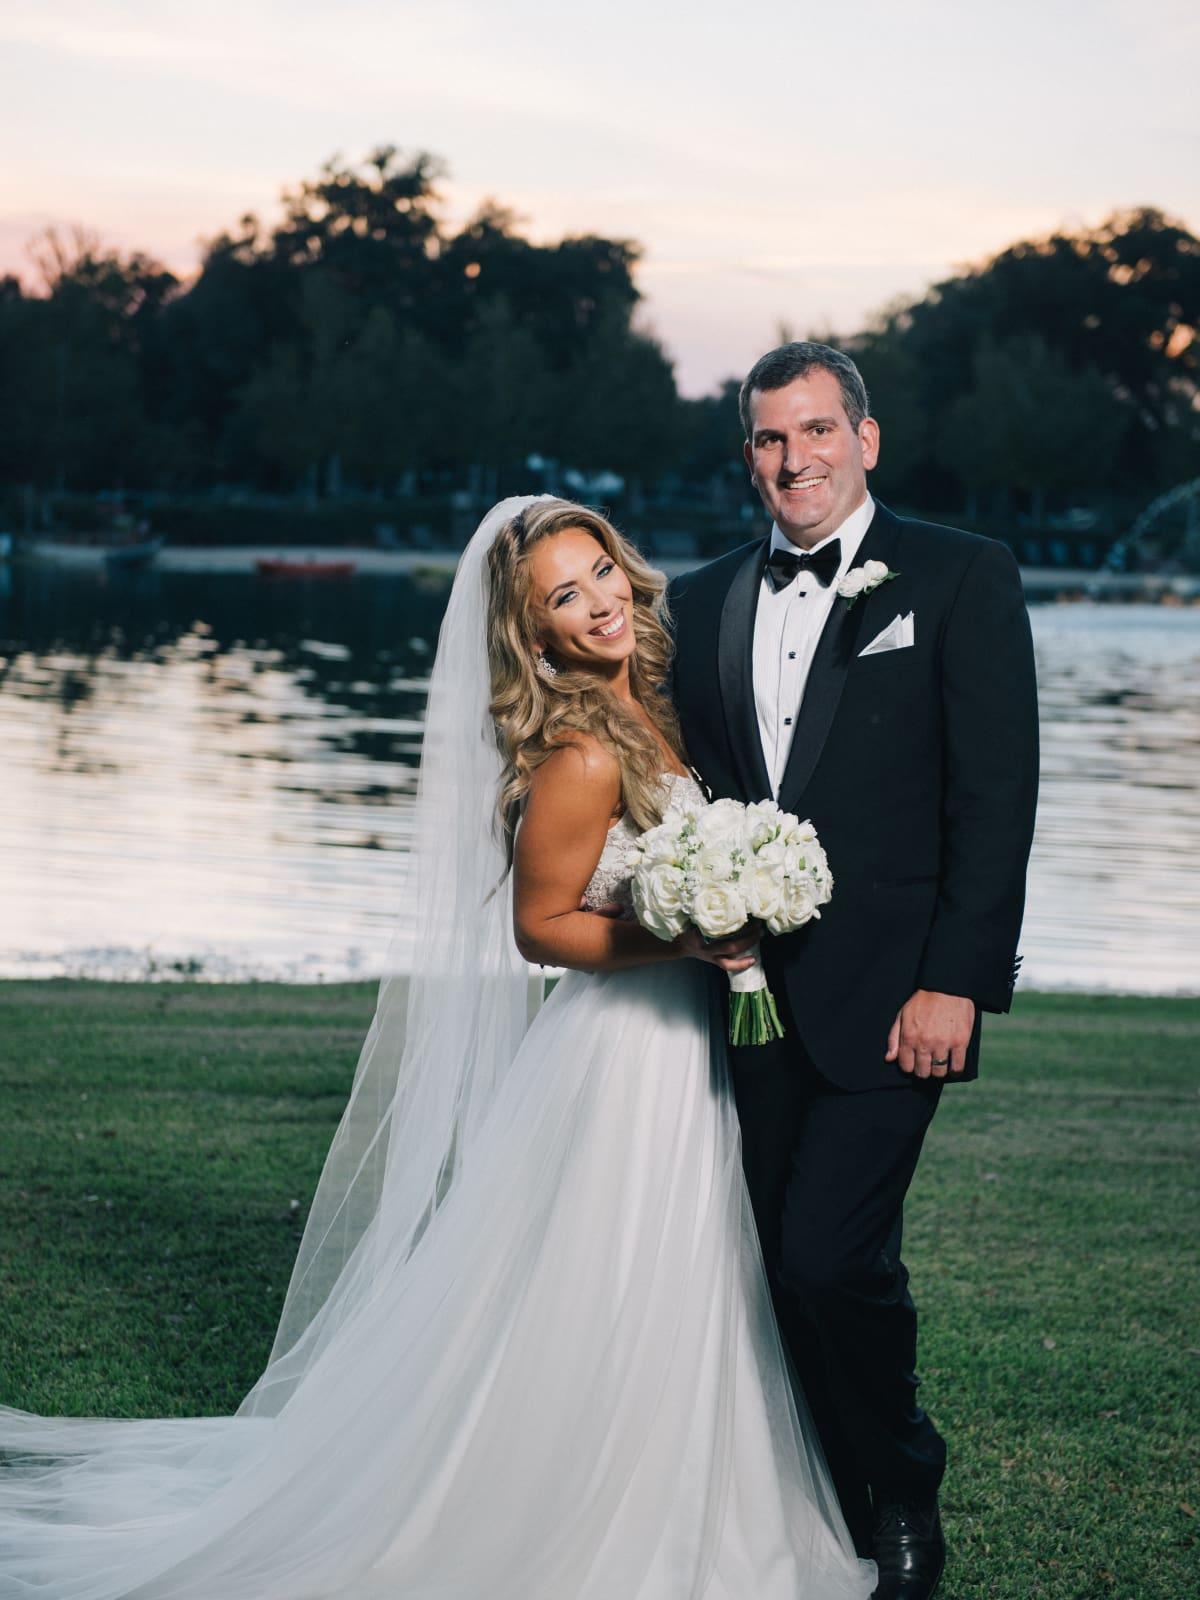 Hartland Hibbetts Wedding, Feb. 2016, Bethany and Matt